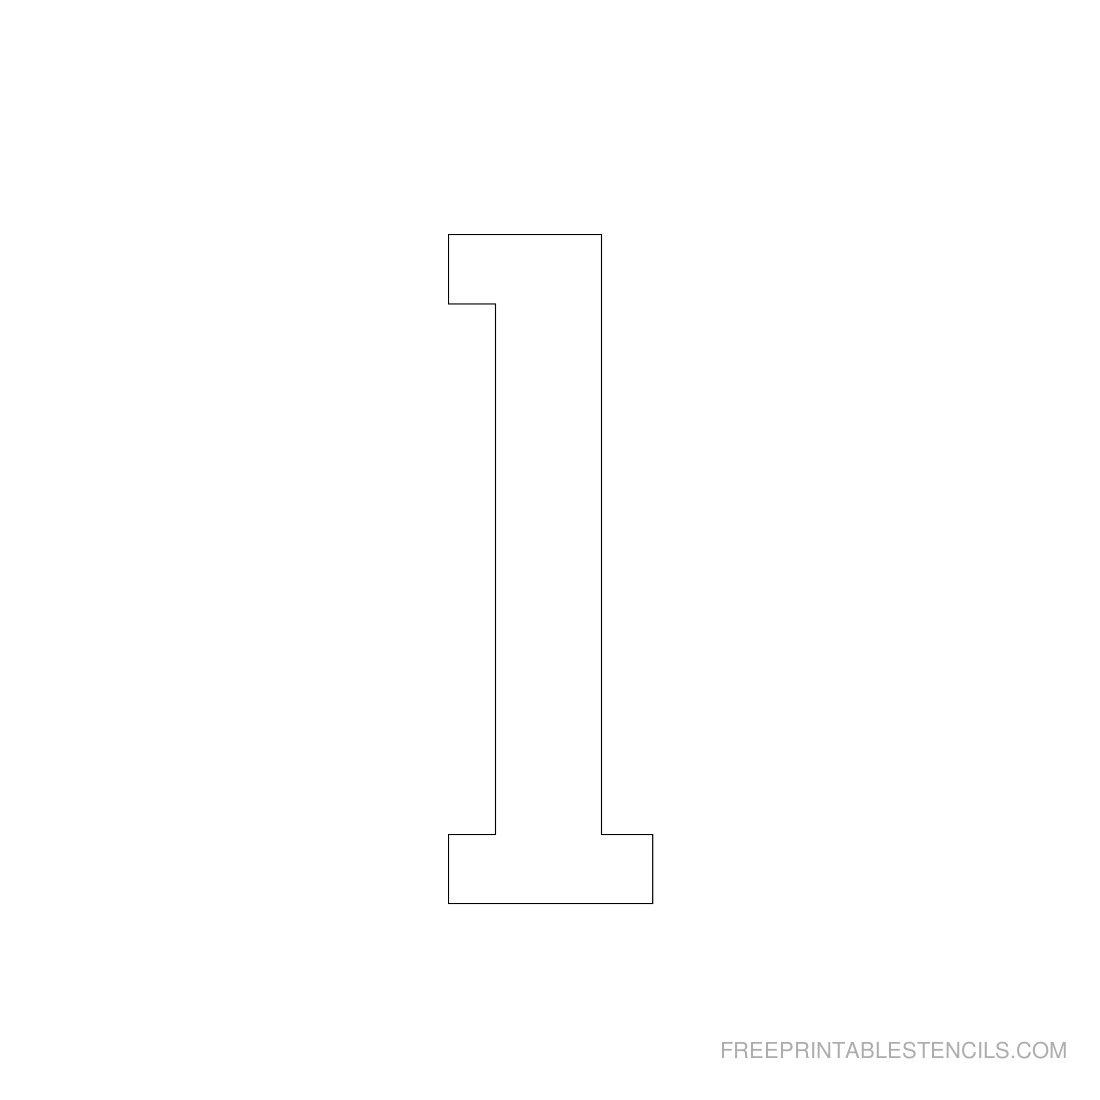 Printable 3 Inch Number Stencils 1-10   Free Printable Stencils - Free Printable 4 Inch Number Stencils